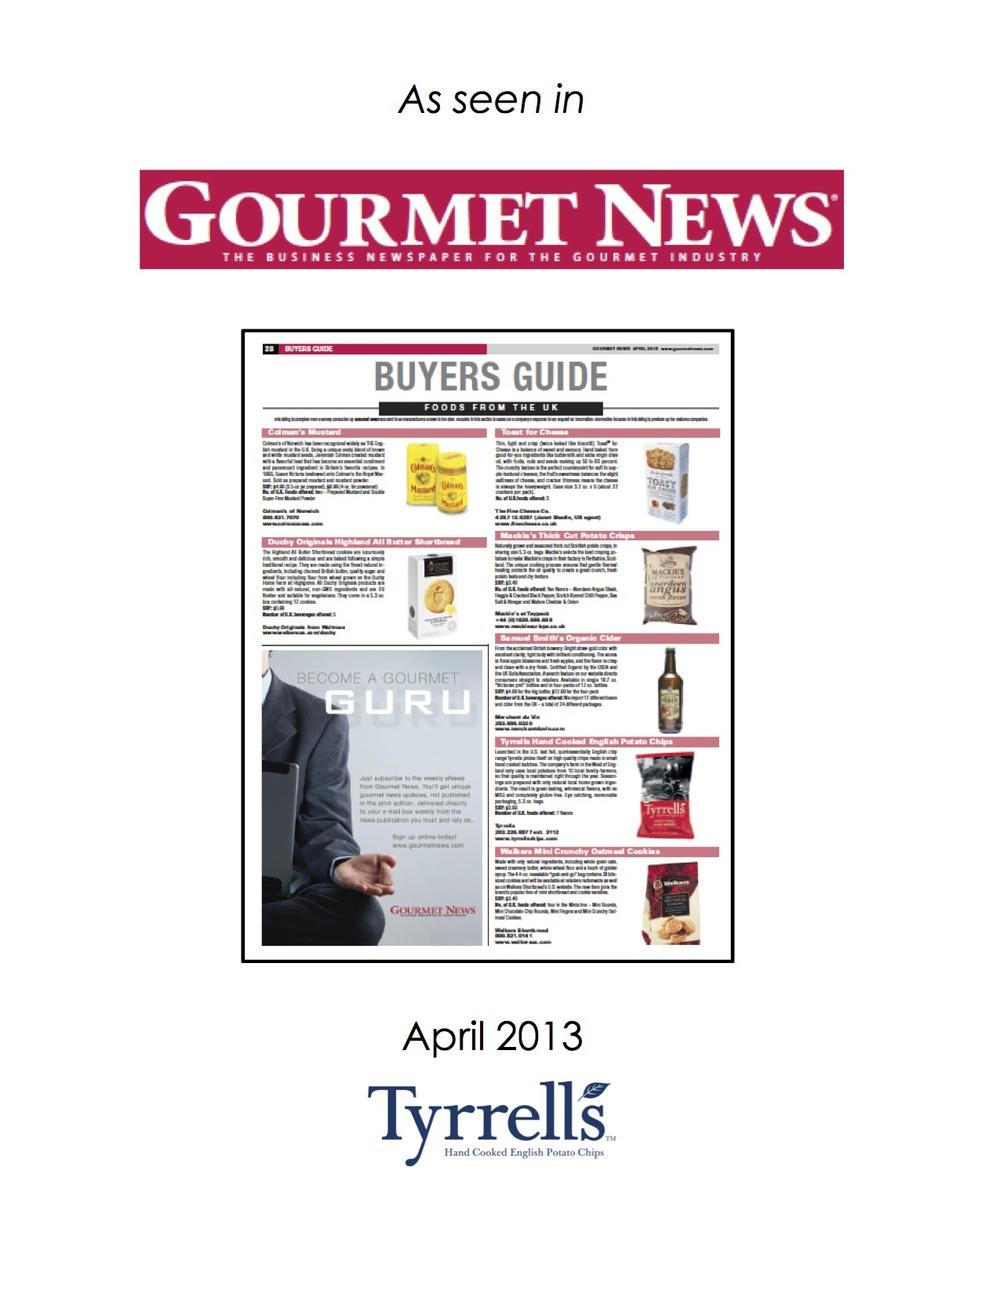 tyrrells-asseenin-gourmetnews copy.jpg